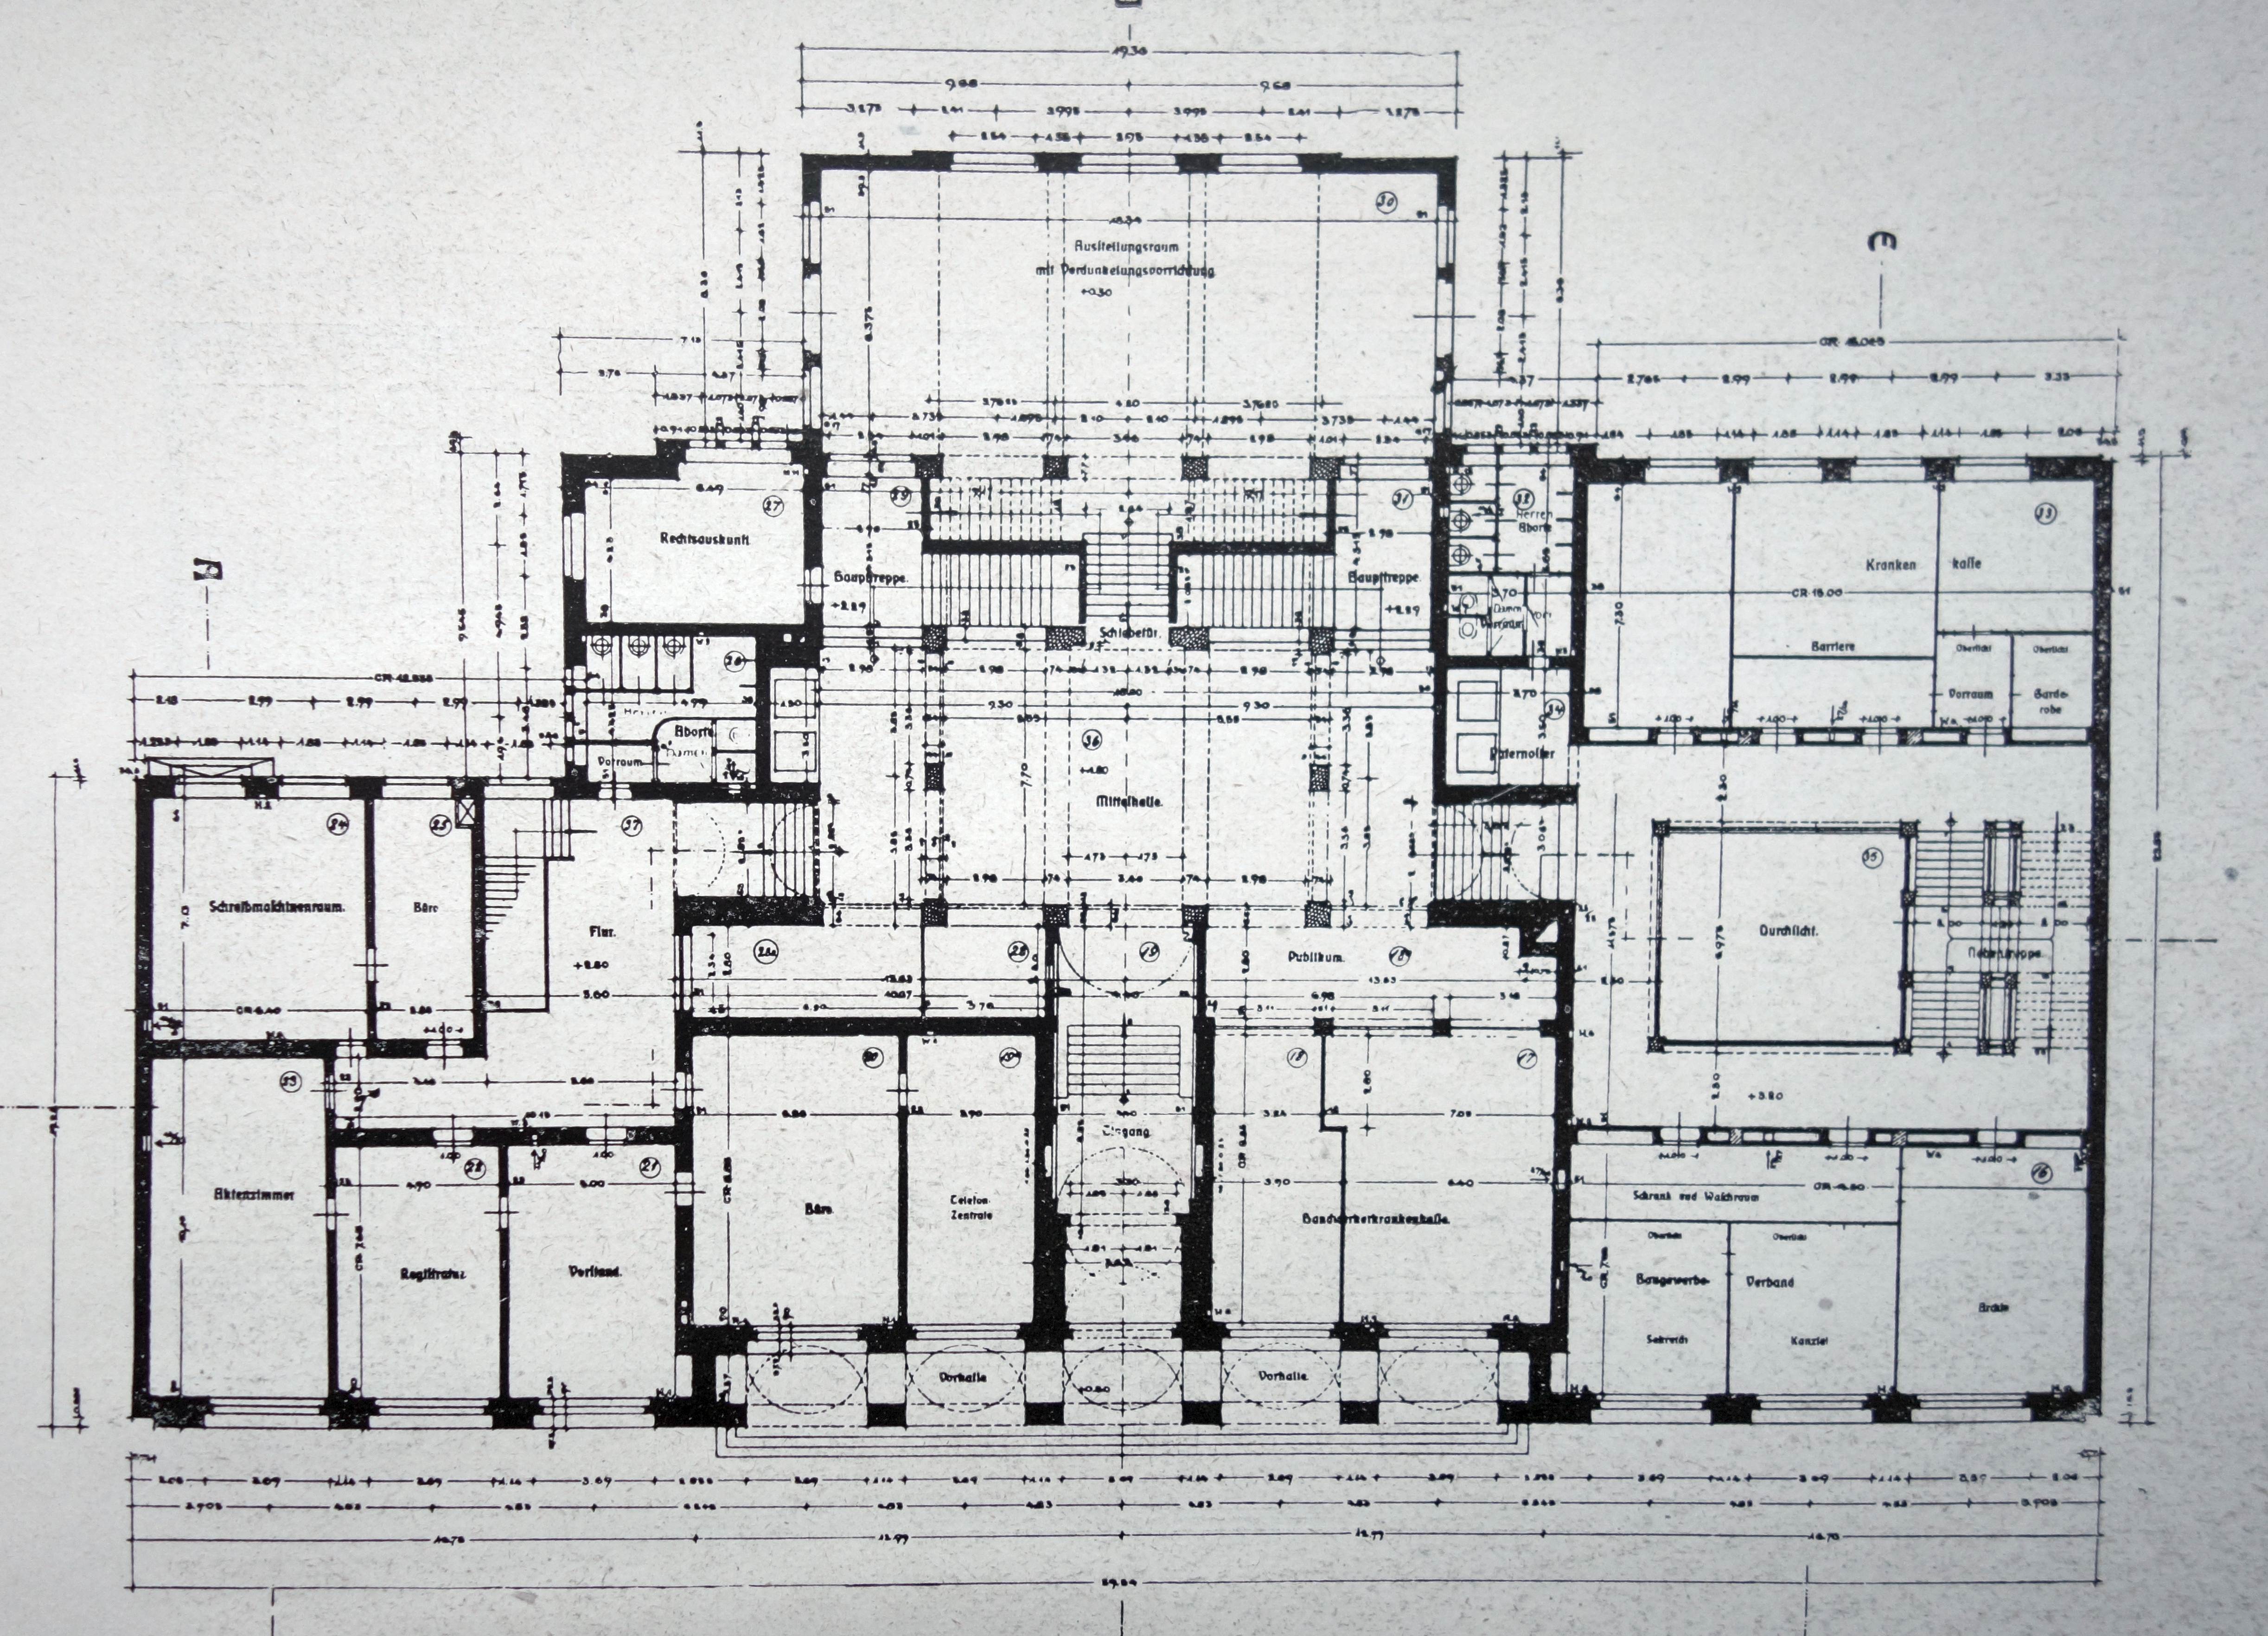 Excellent Sch Viewer Images - Electrical Circuit Diagram Ideas ...